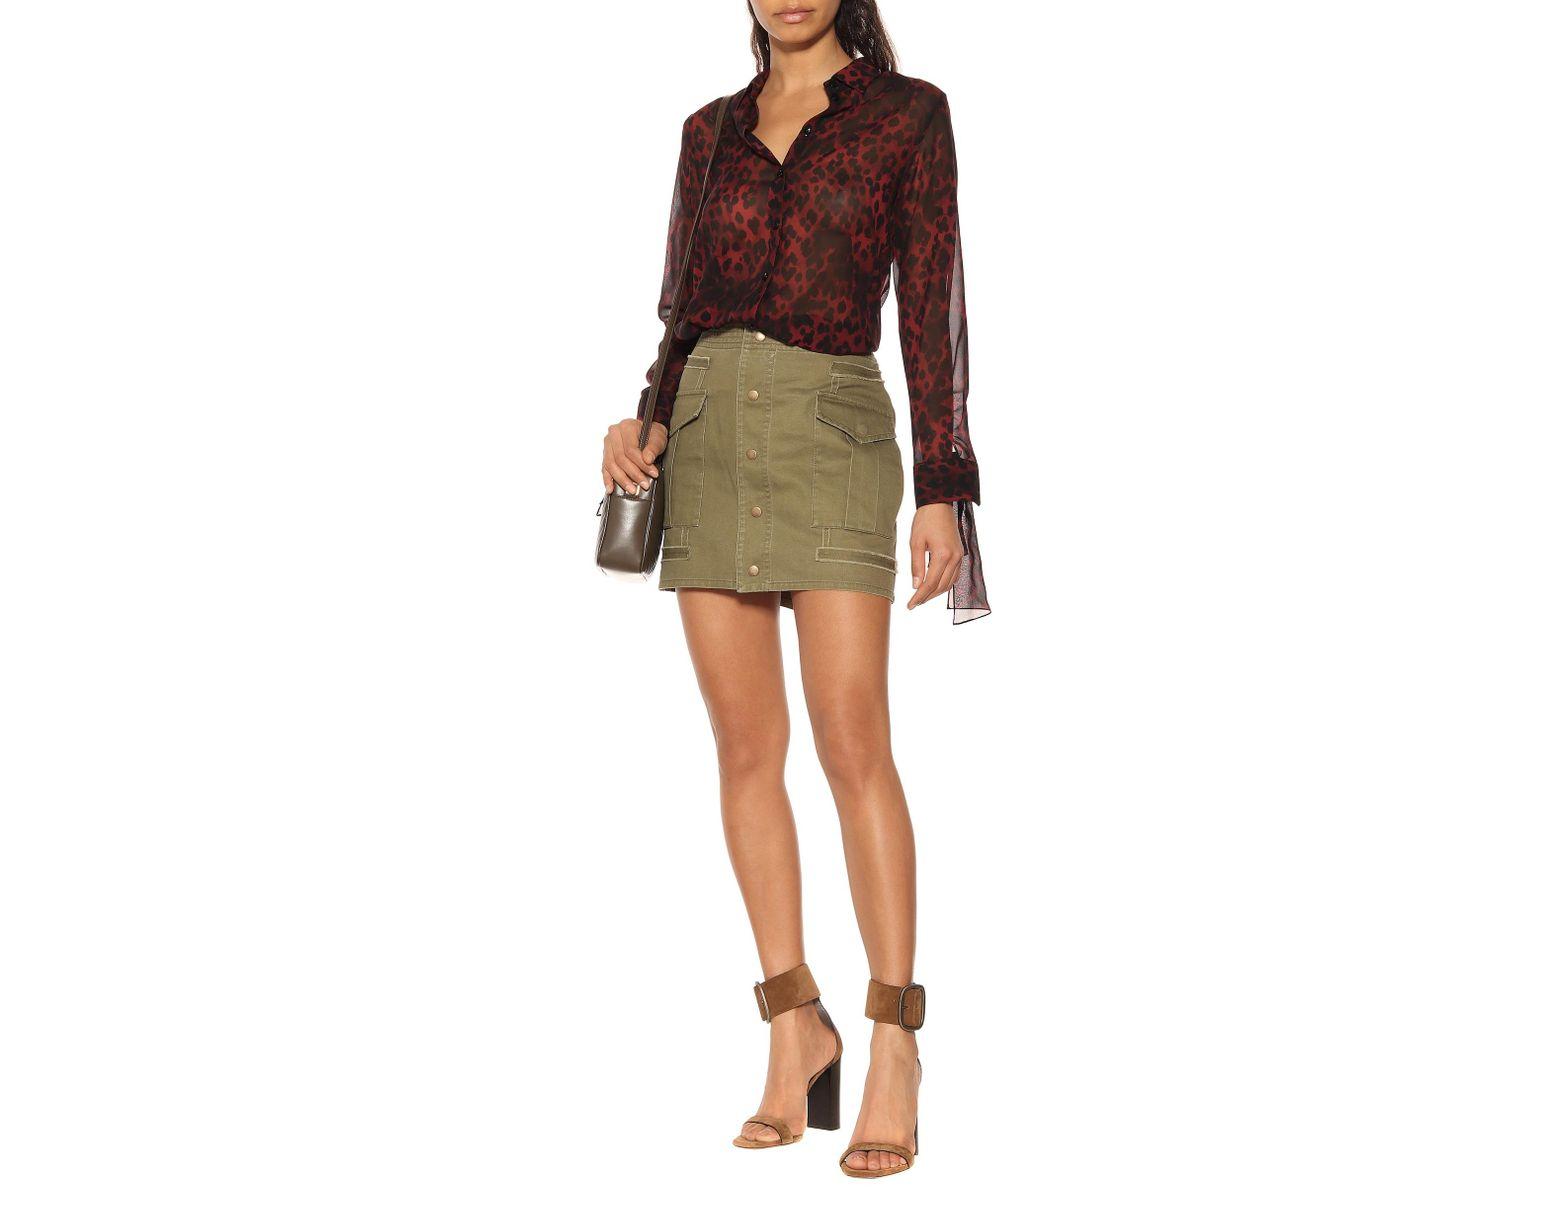 c3db0e2e6 Minifalda de gabardina de algodón de mujer de color verde